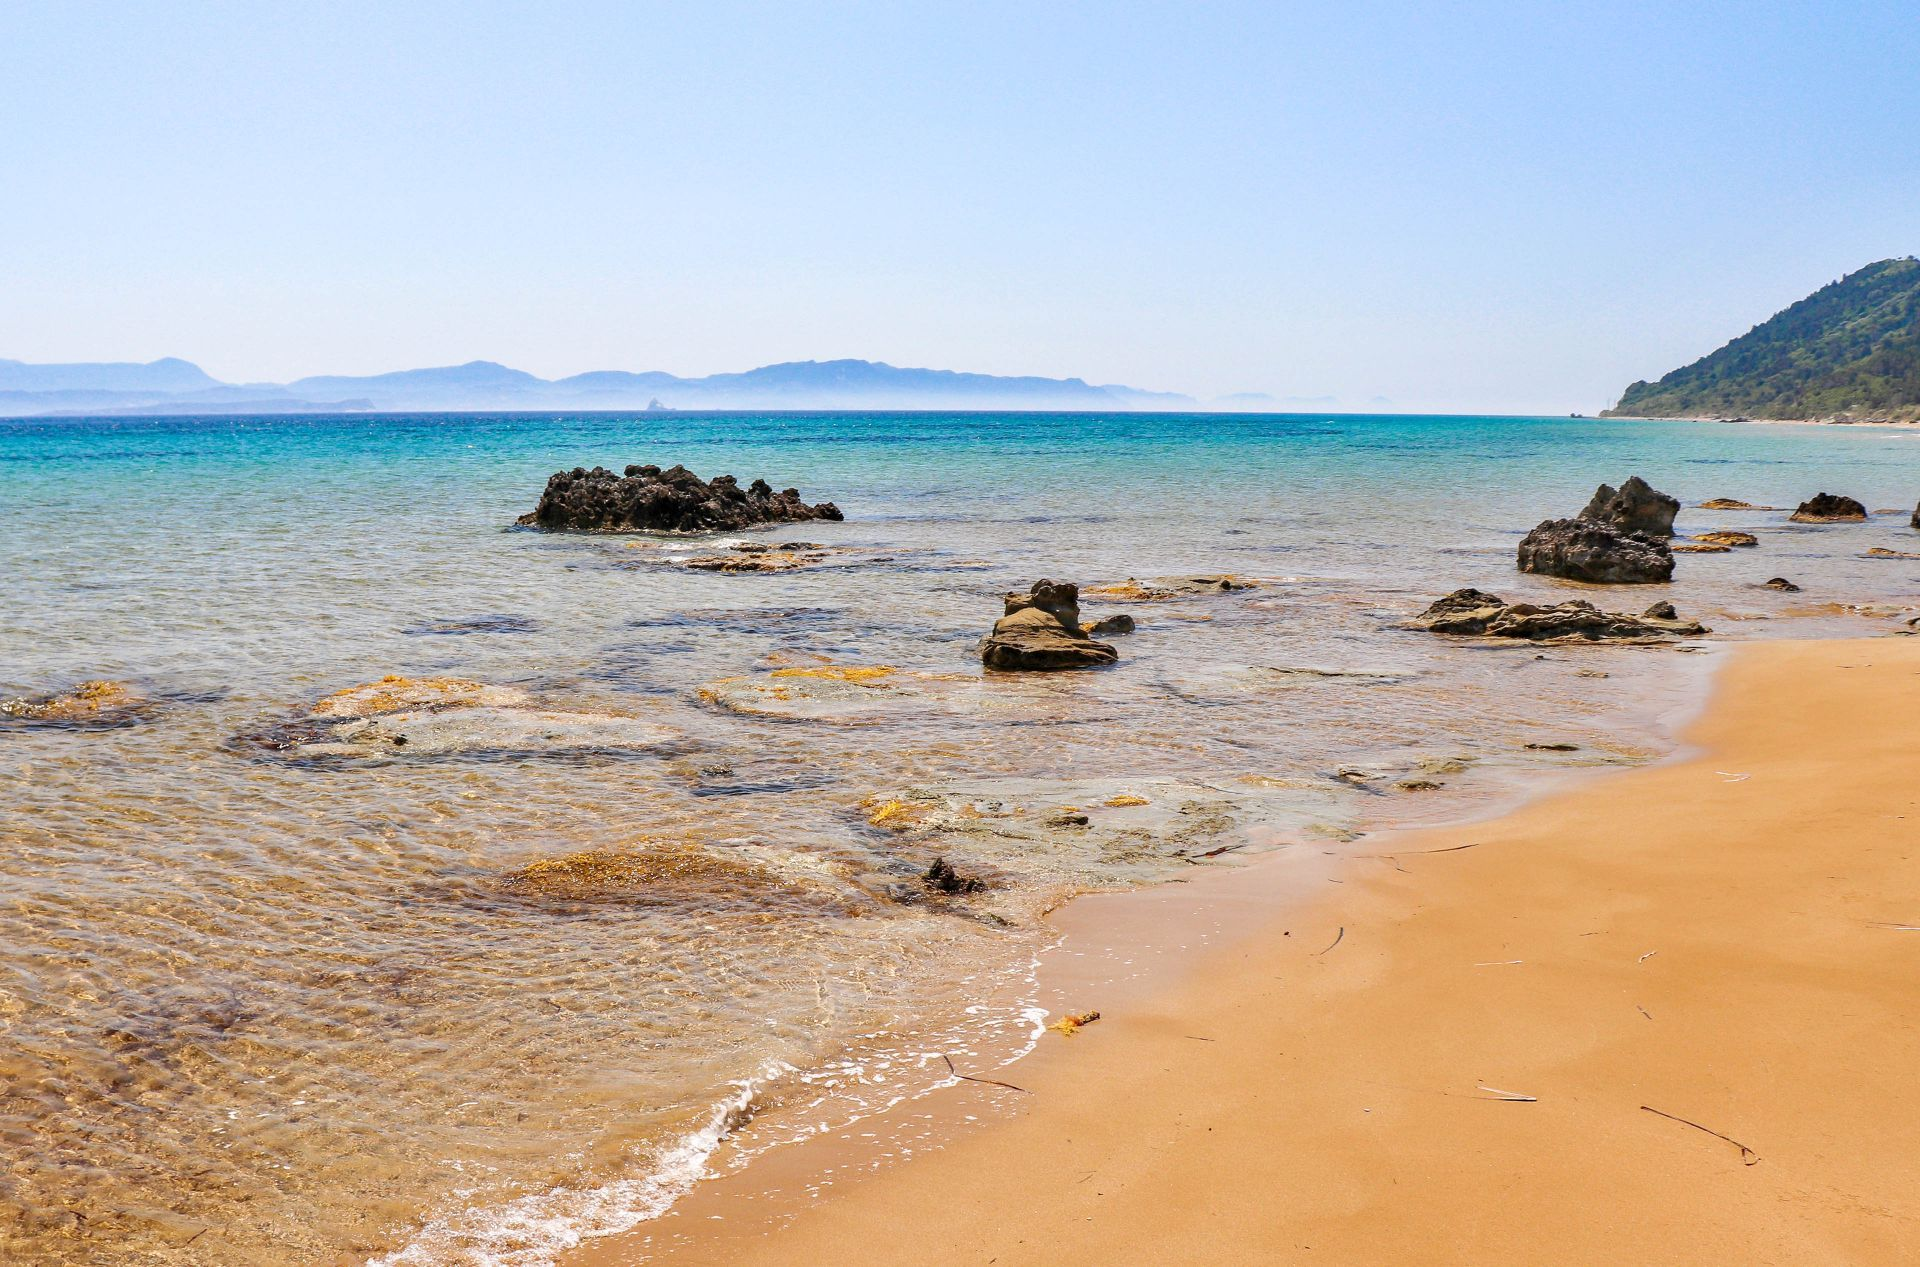 Mathraki island: Beaches